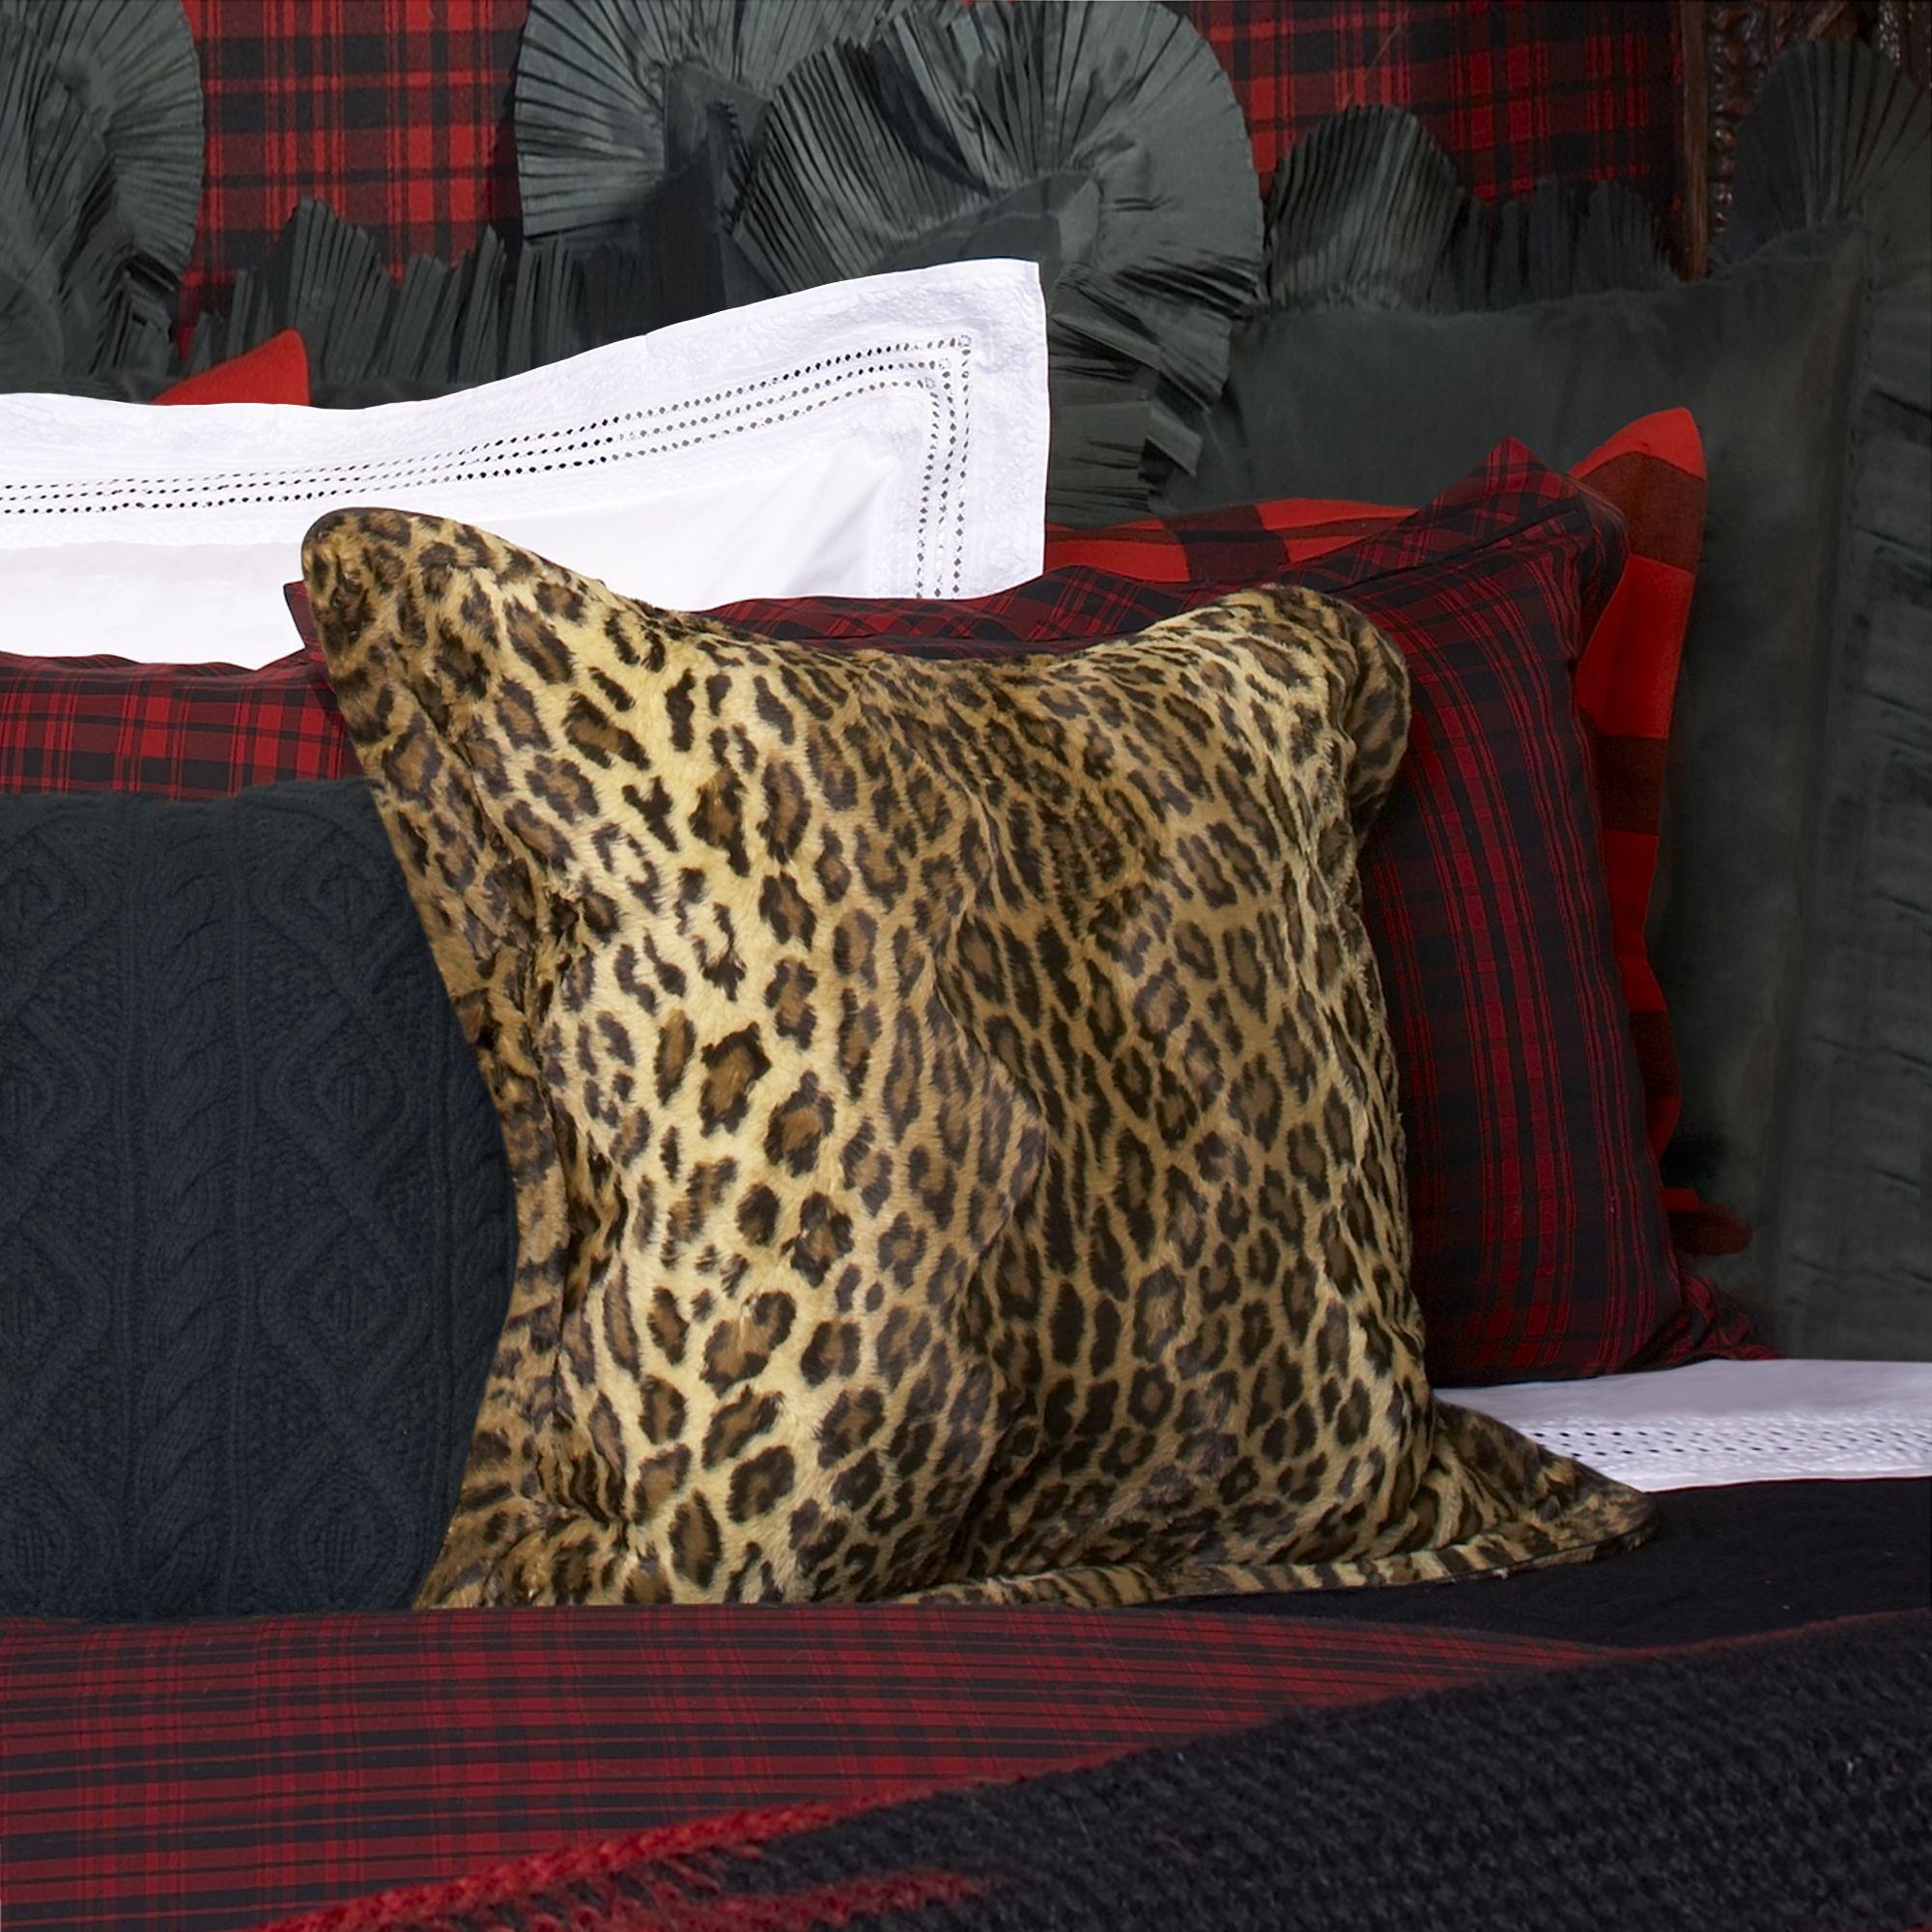 Aragon Leopard Throw Pillow Pillows, Throw pillows